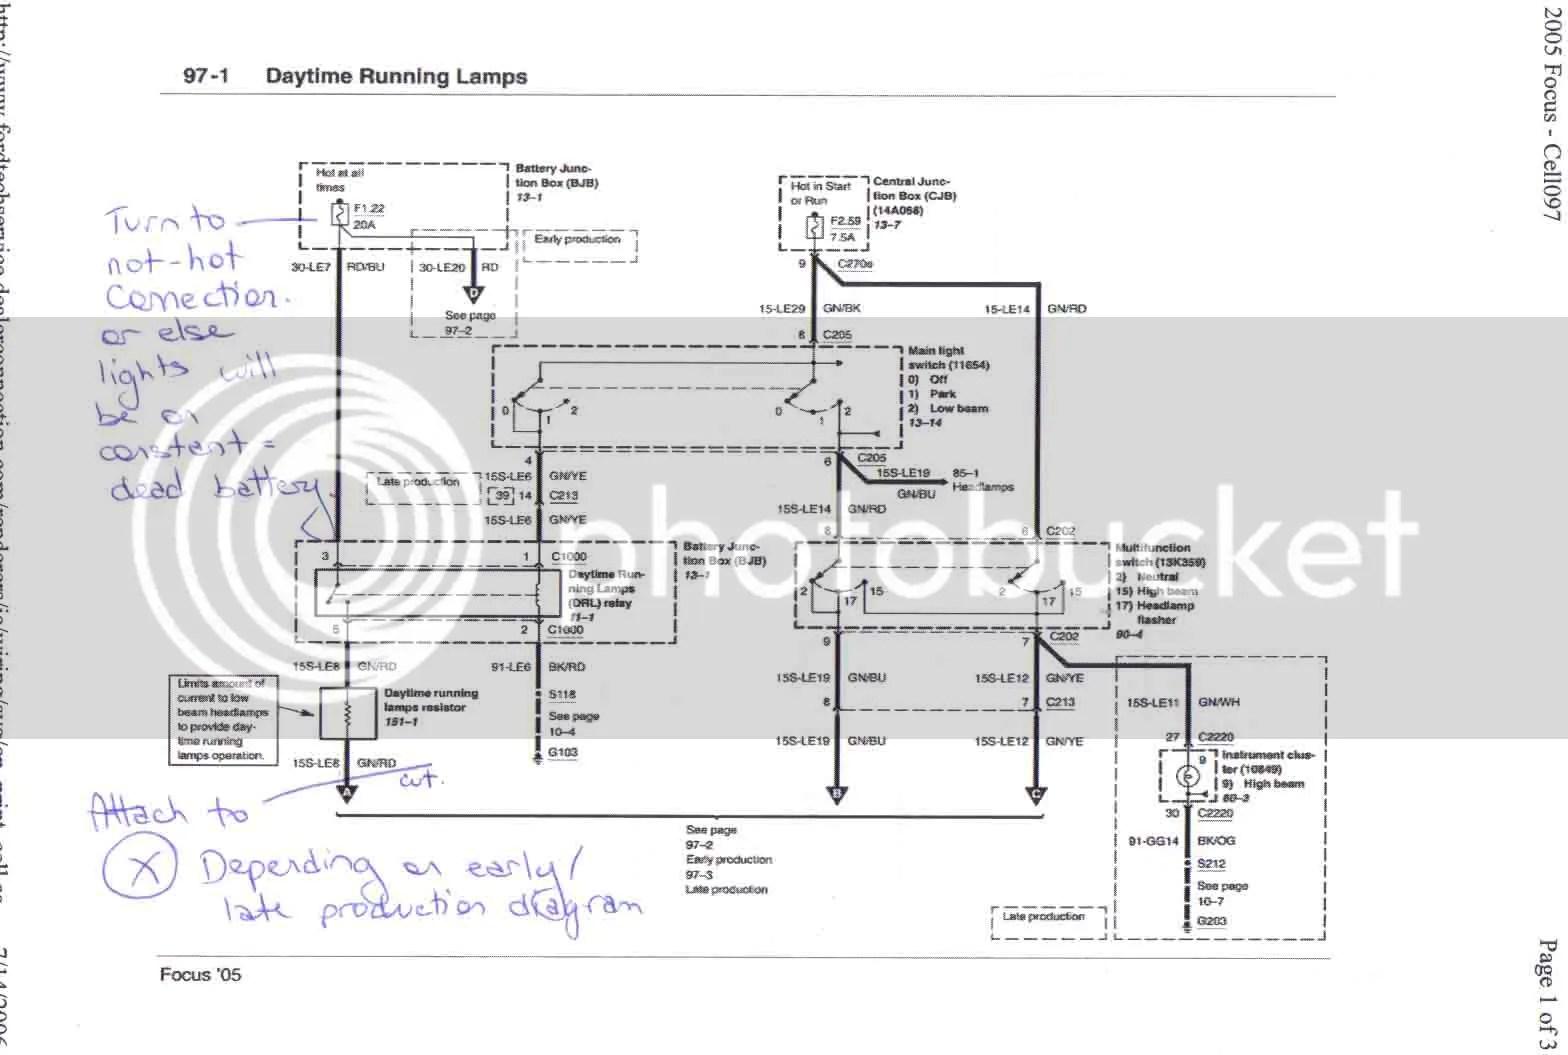 parts of a comet diagram wiring 3 way switch 2 lights 1963 mercury imageresizertool com